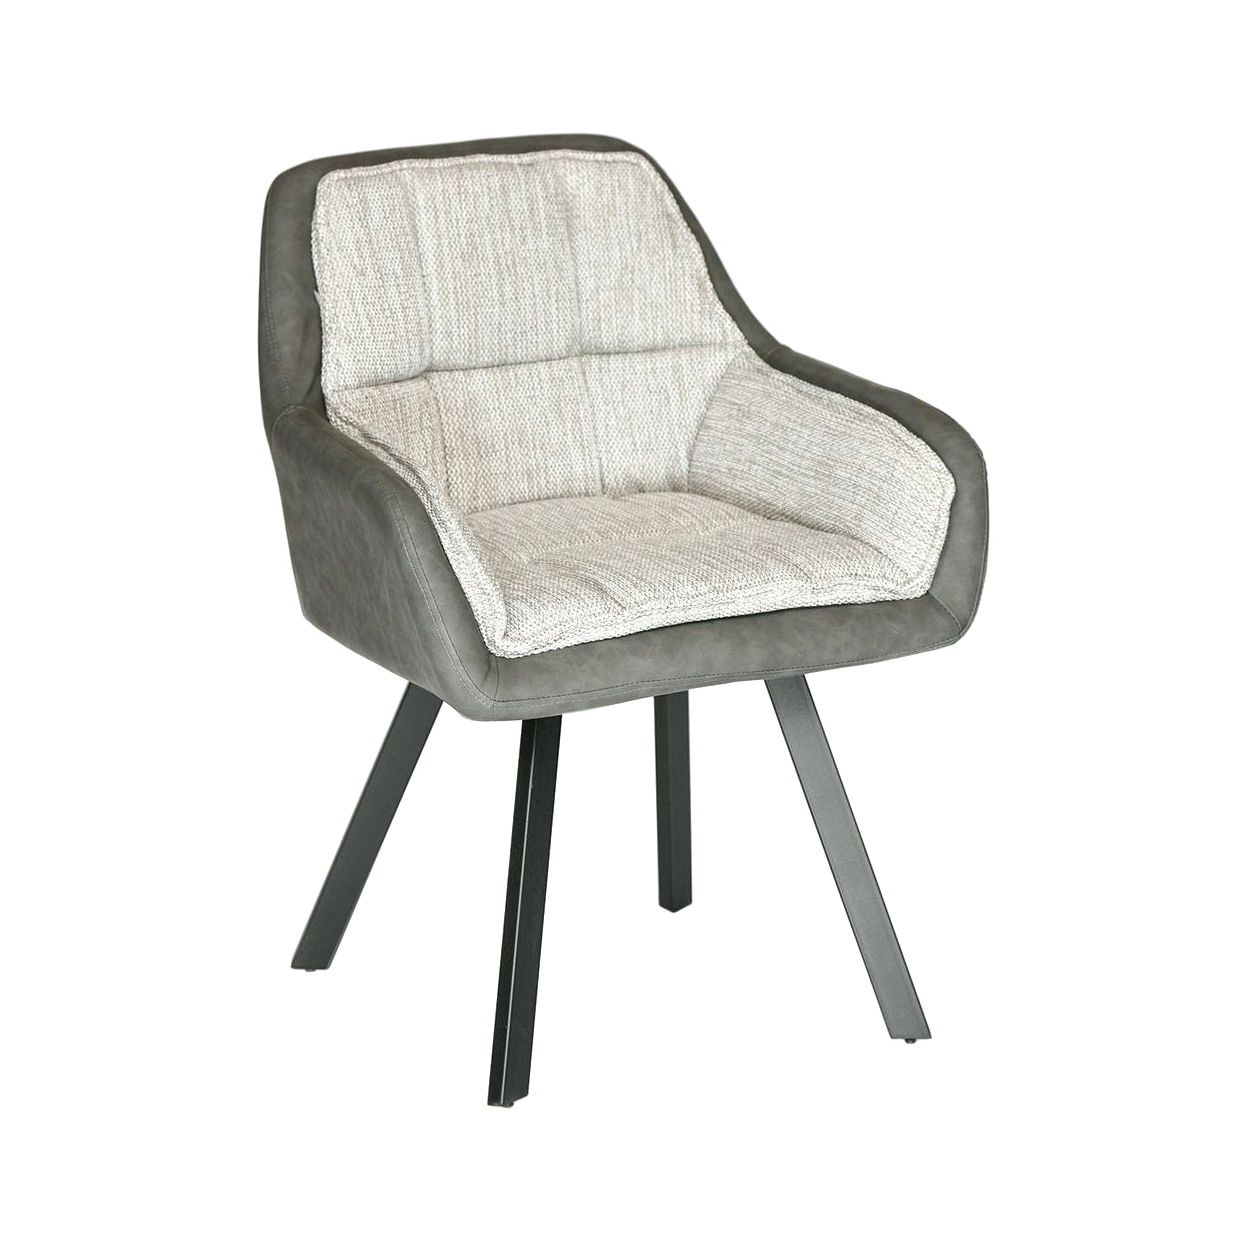 Кресло TC серый/бежевый 63х66х84 см кресло tc натуральный бежевый 65х56х77 см